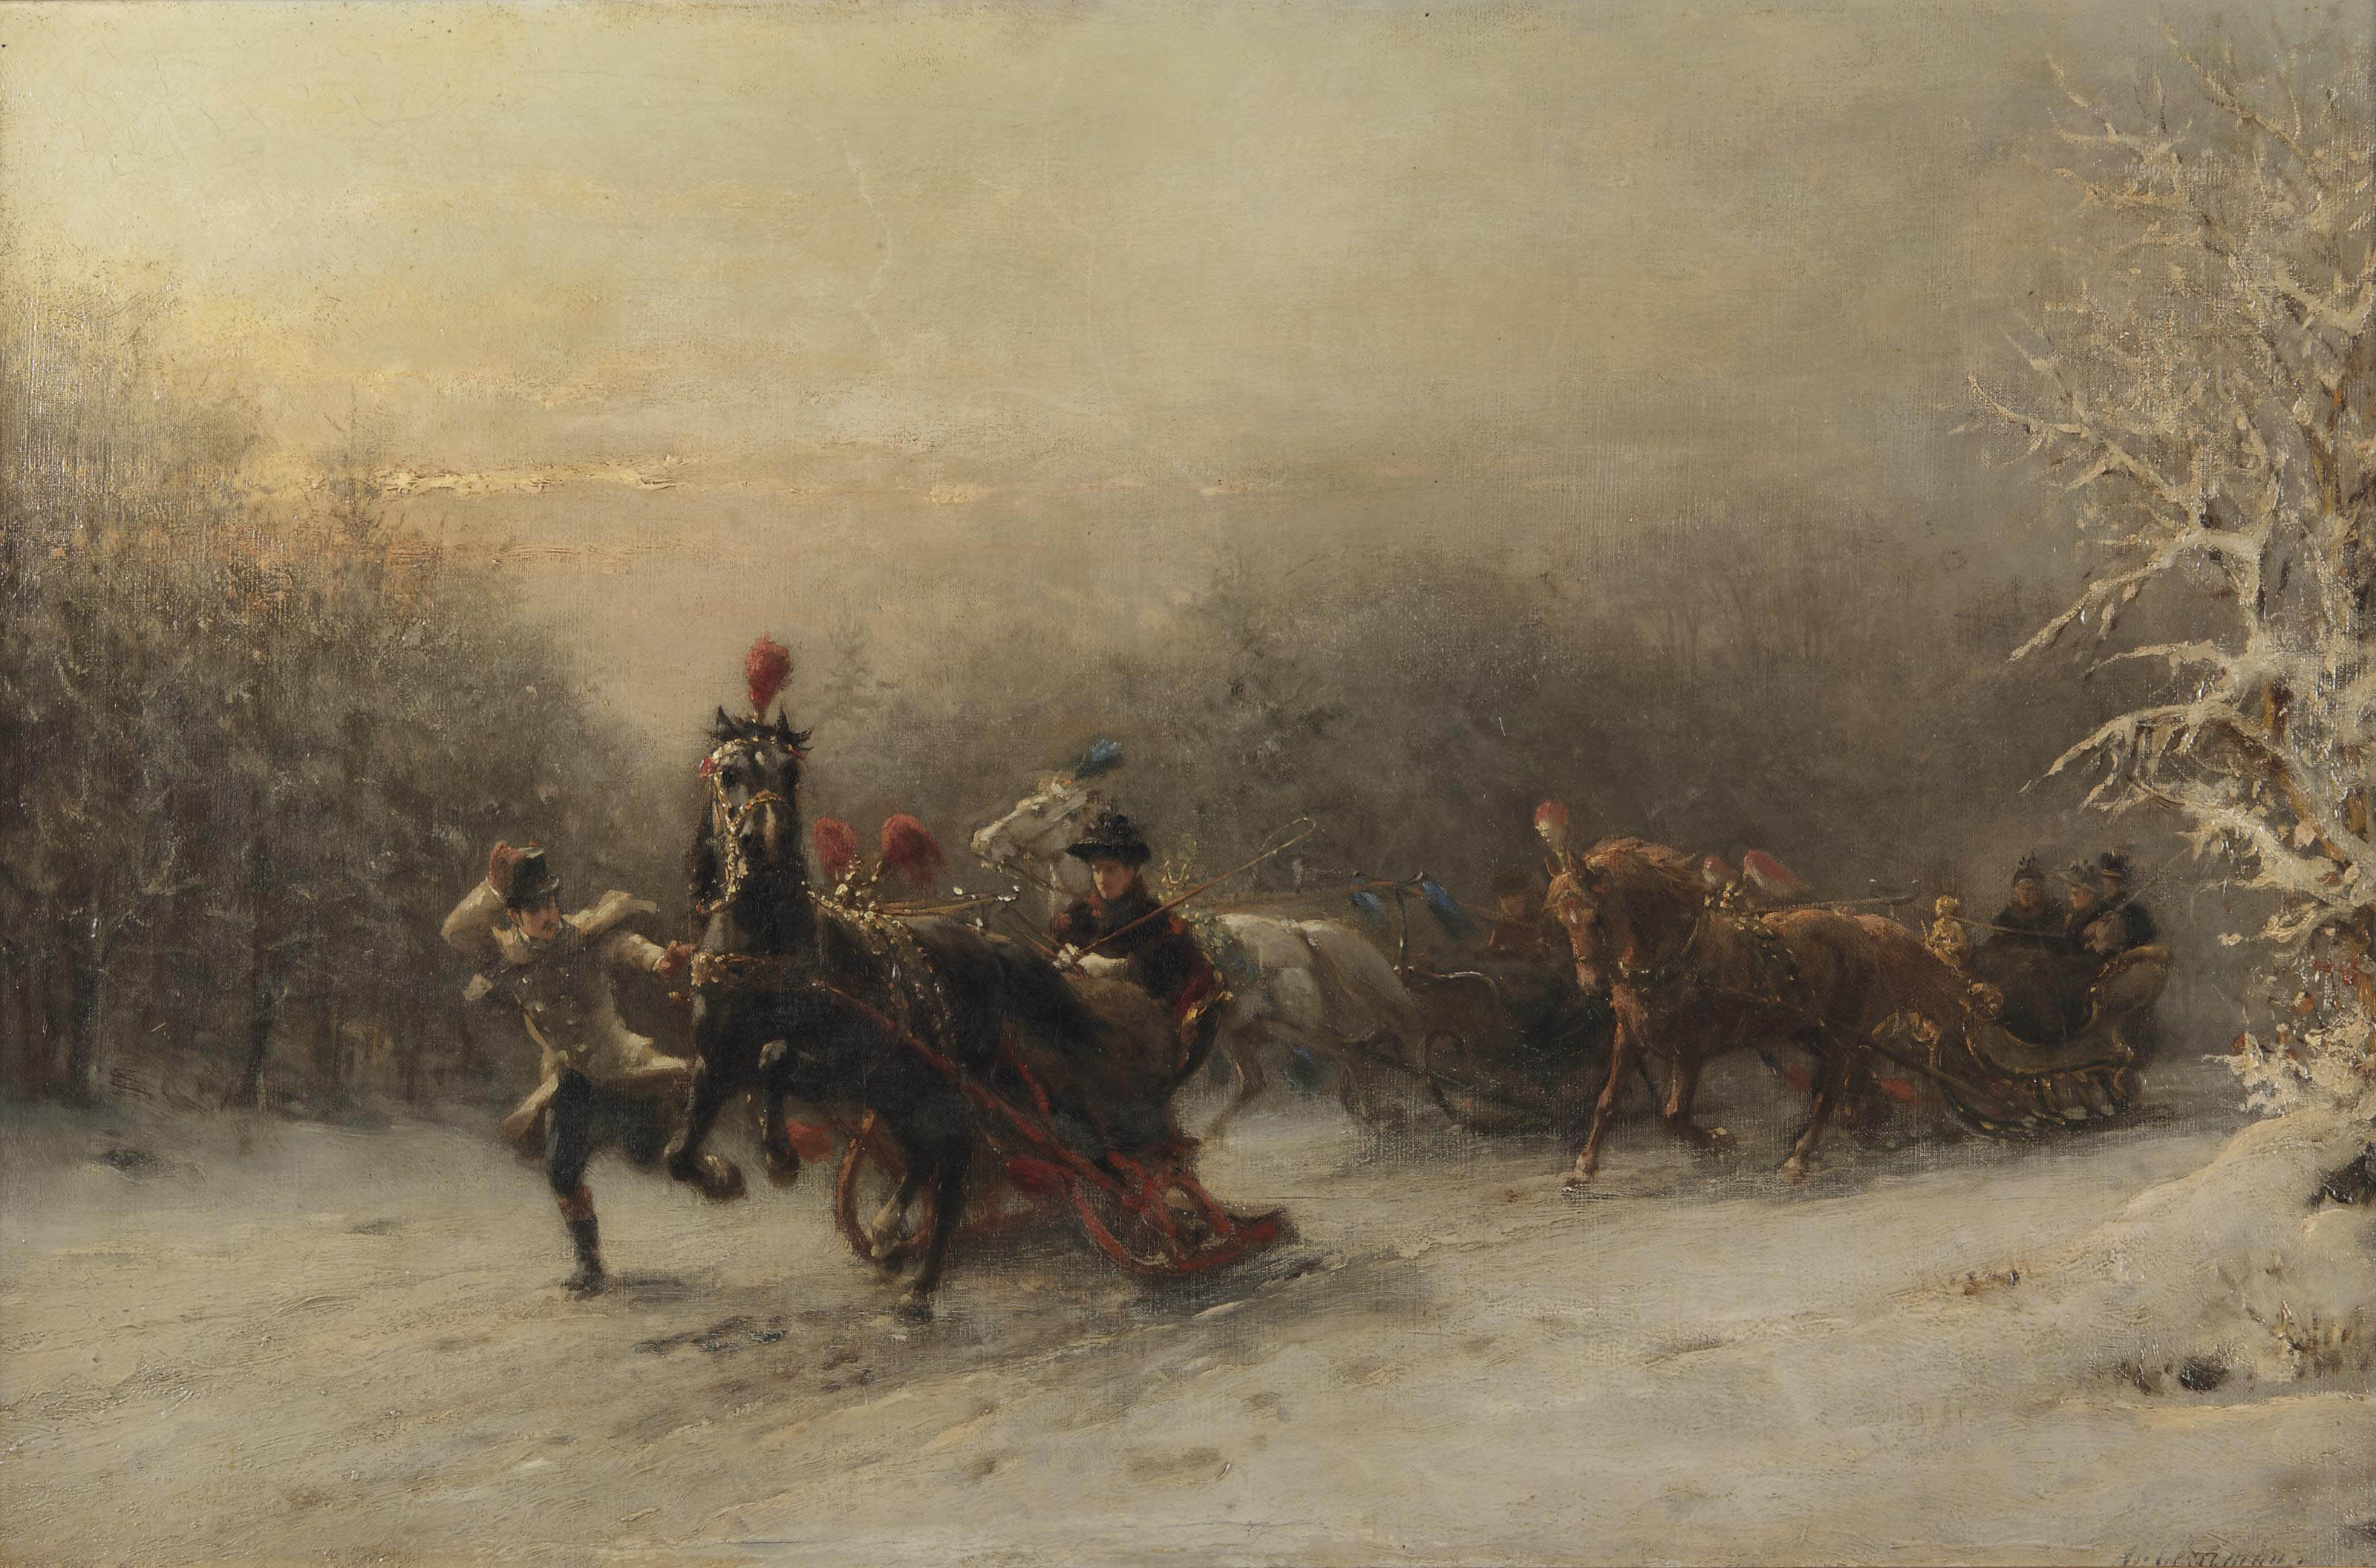 The sleigh-ride